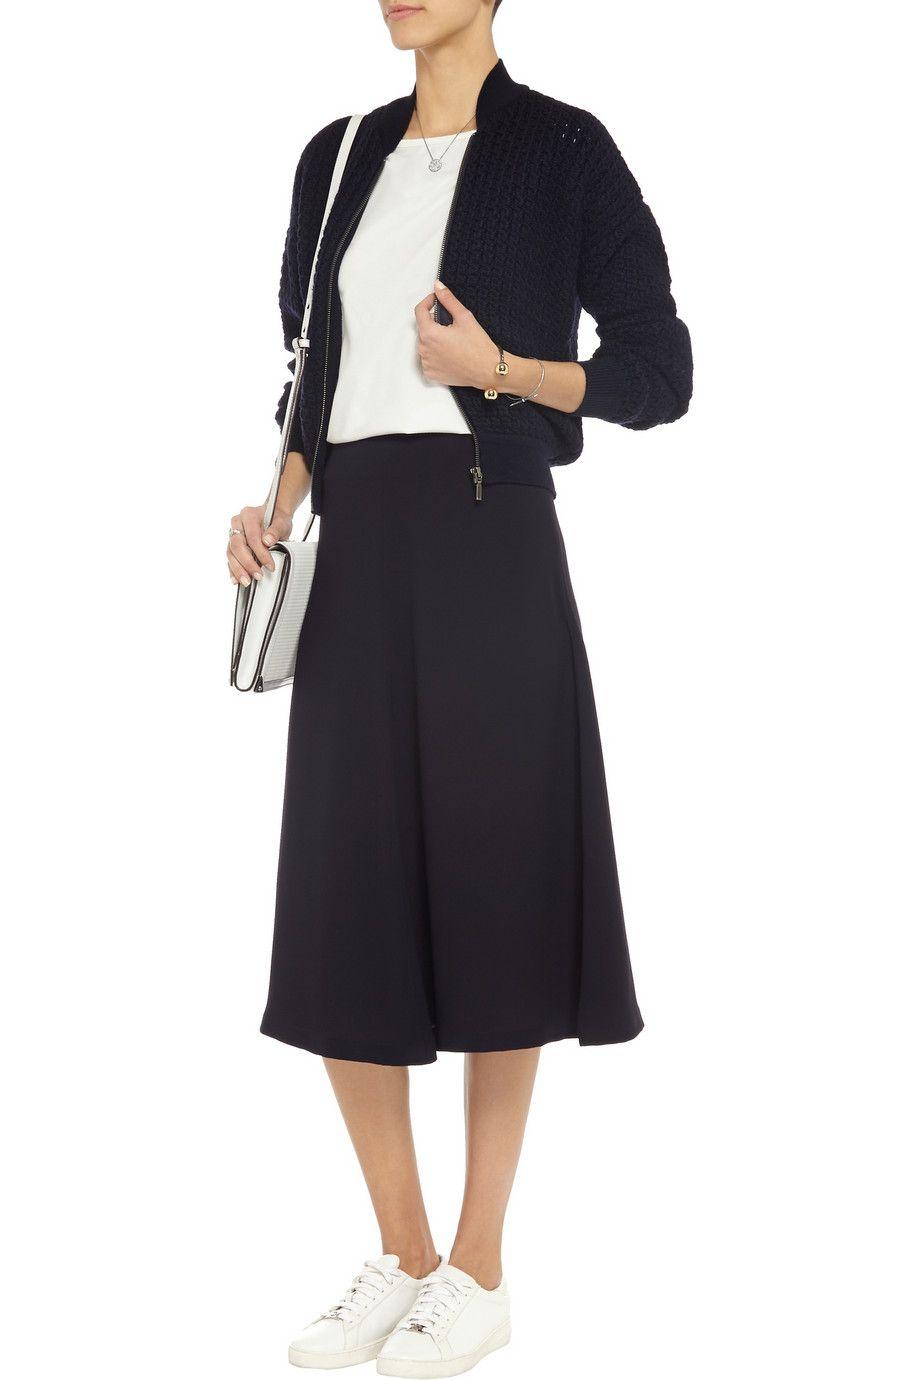 Off white flannel coat  JOIE Donelle merino wool jacket  Original price